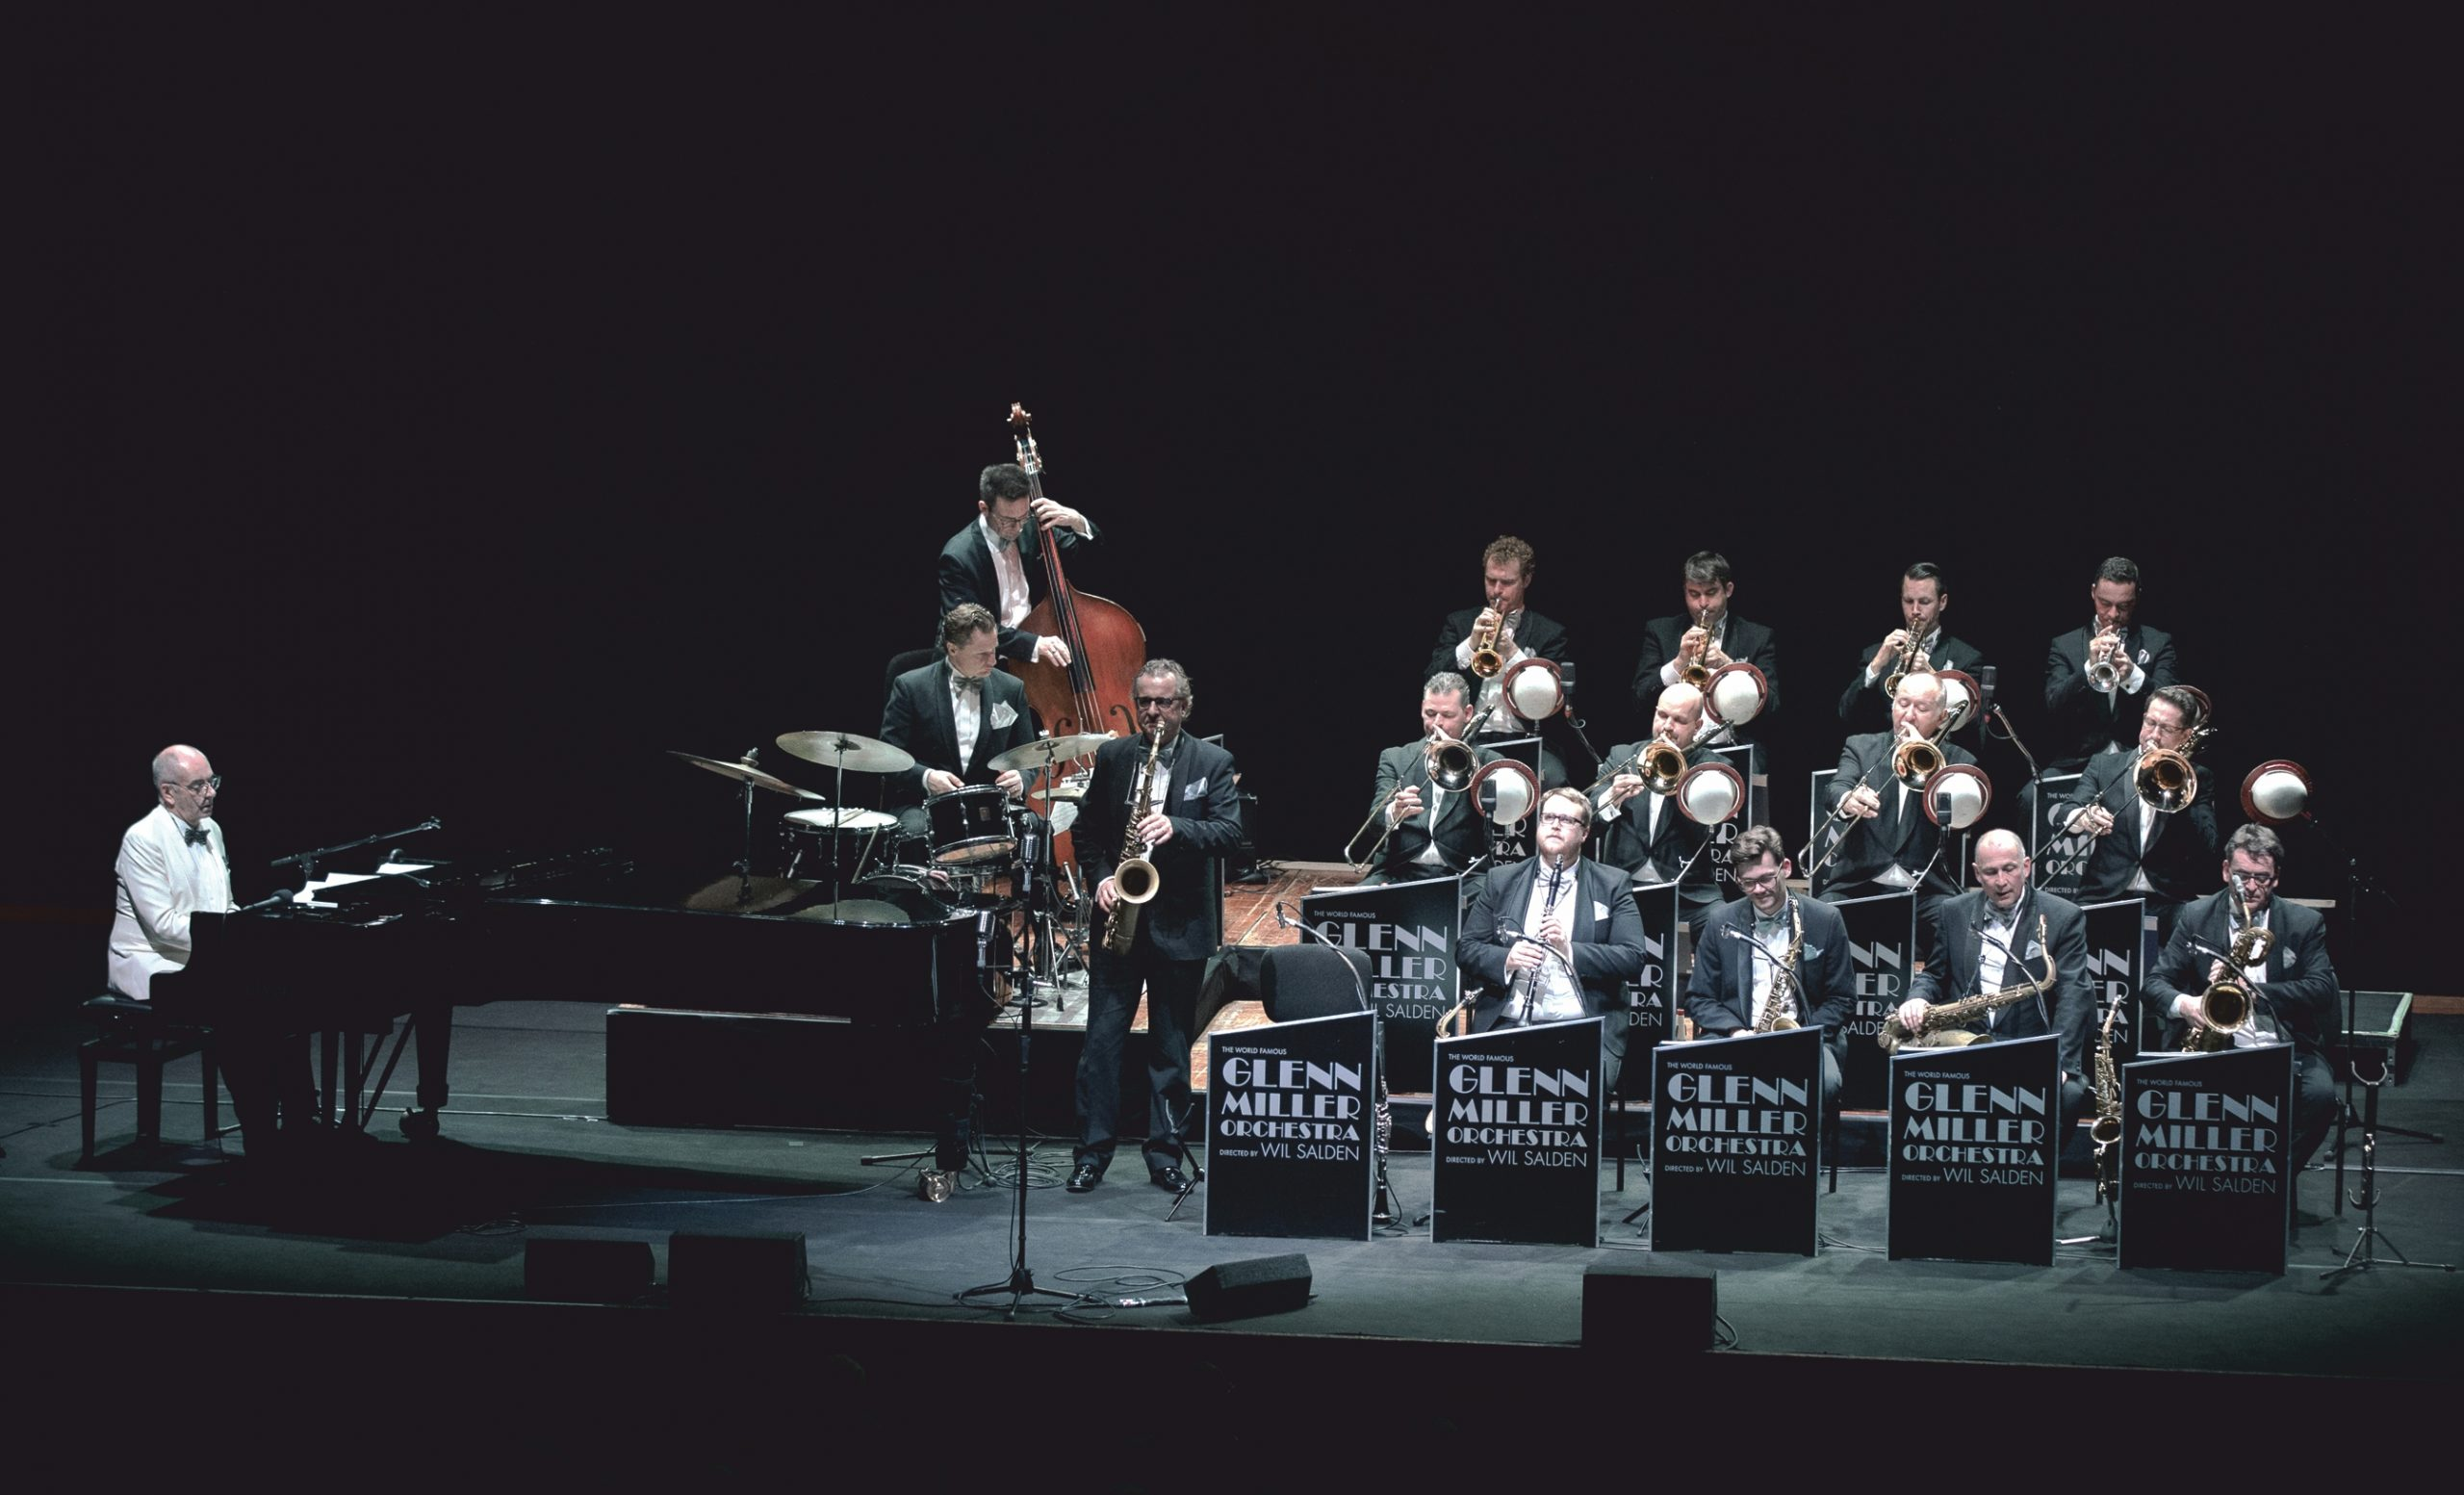 The World Famous Glenn Miller Orchestra directed by Wil Salden am 25. January 2021 @ Konzerthaus Wien.